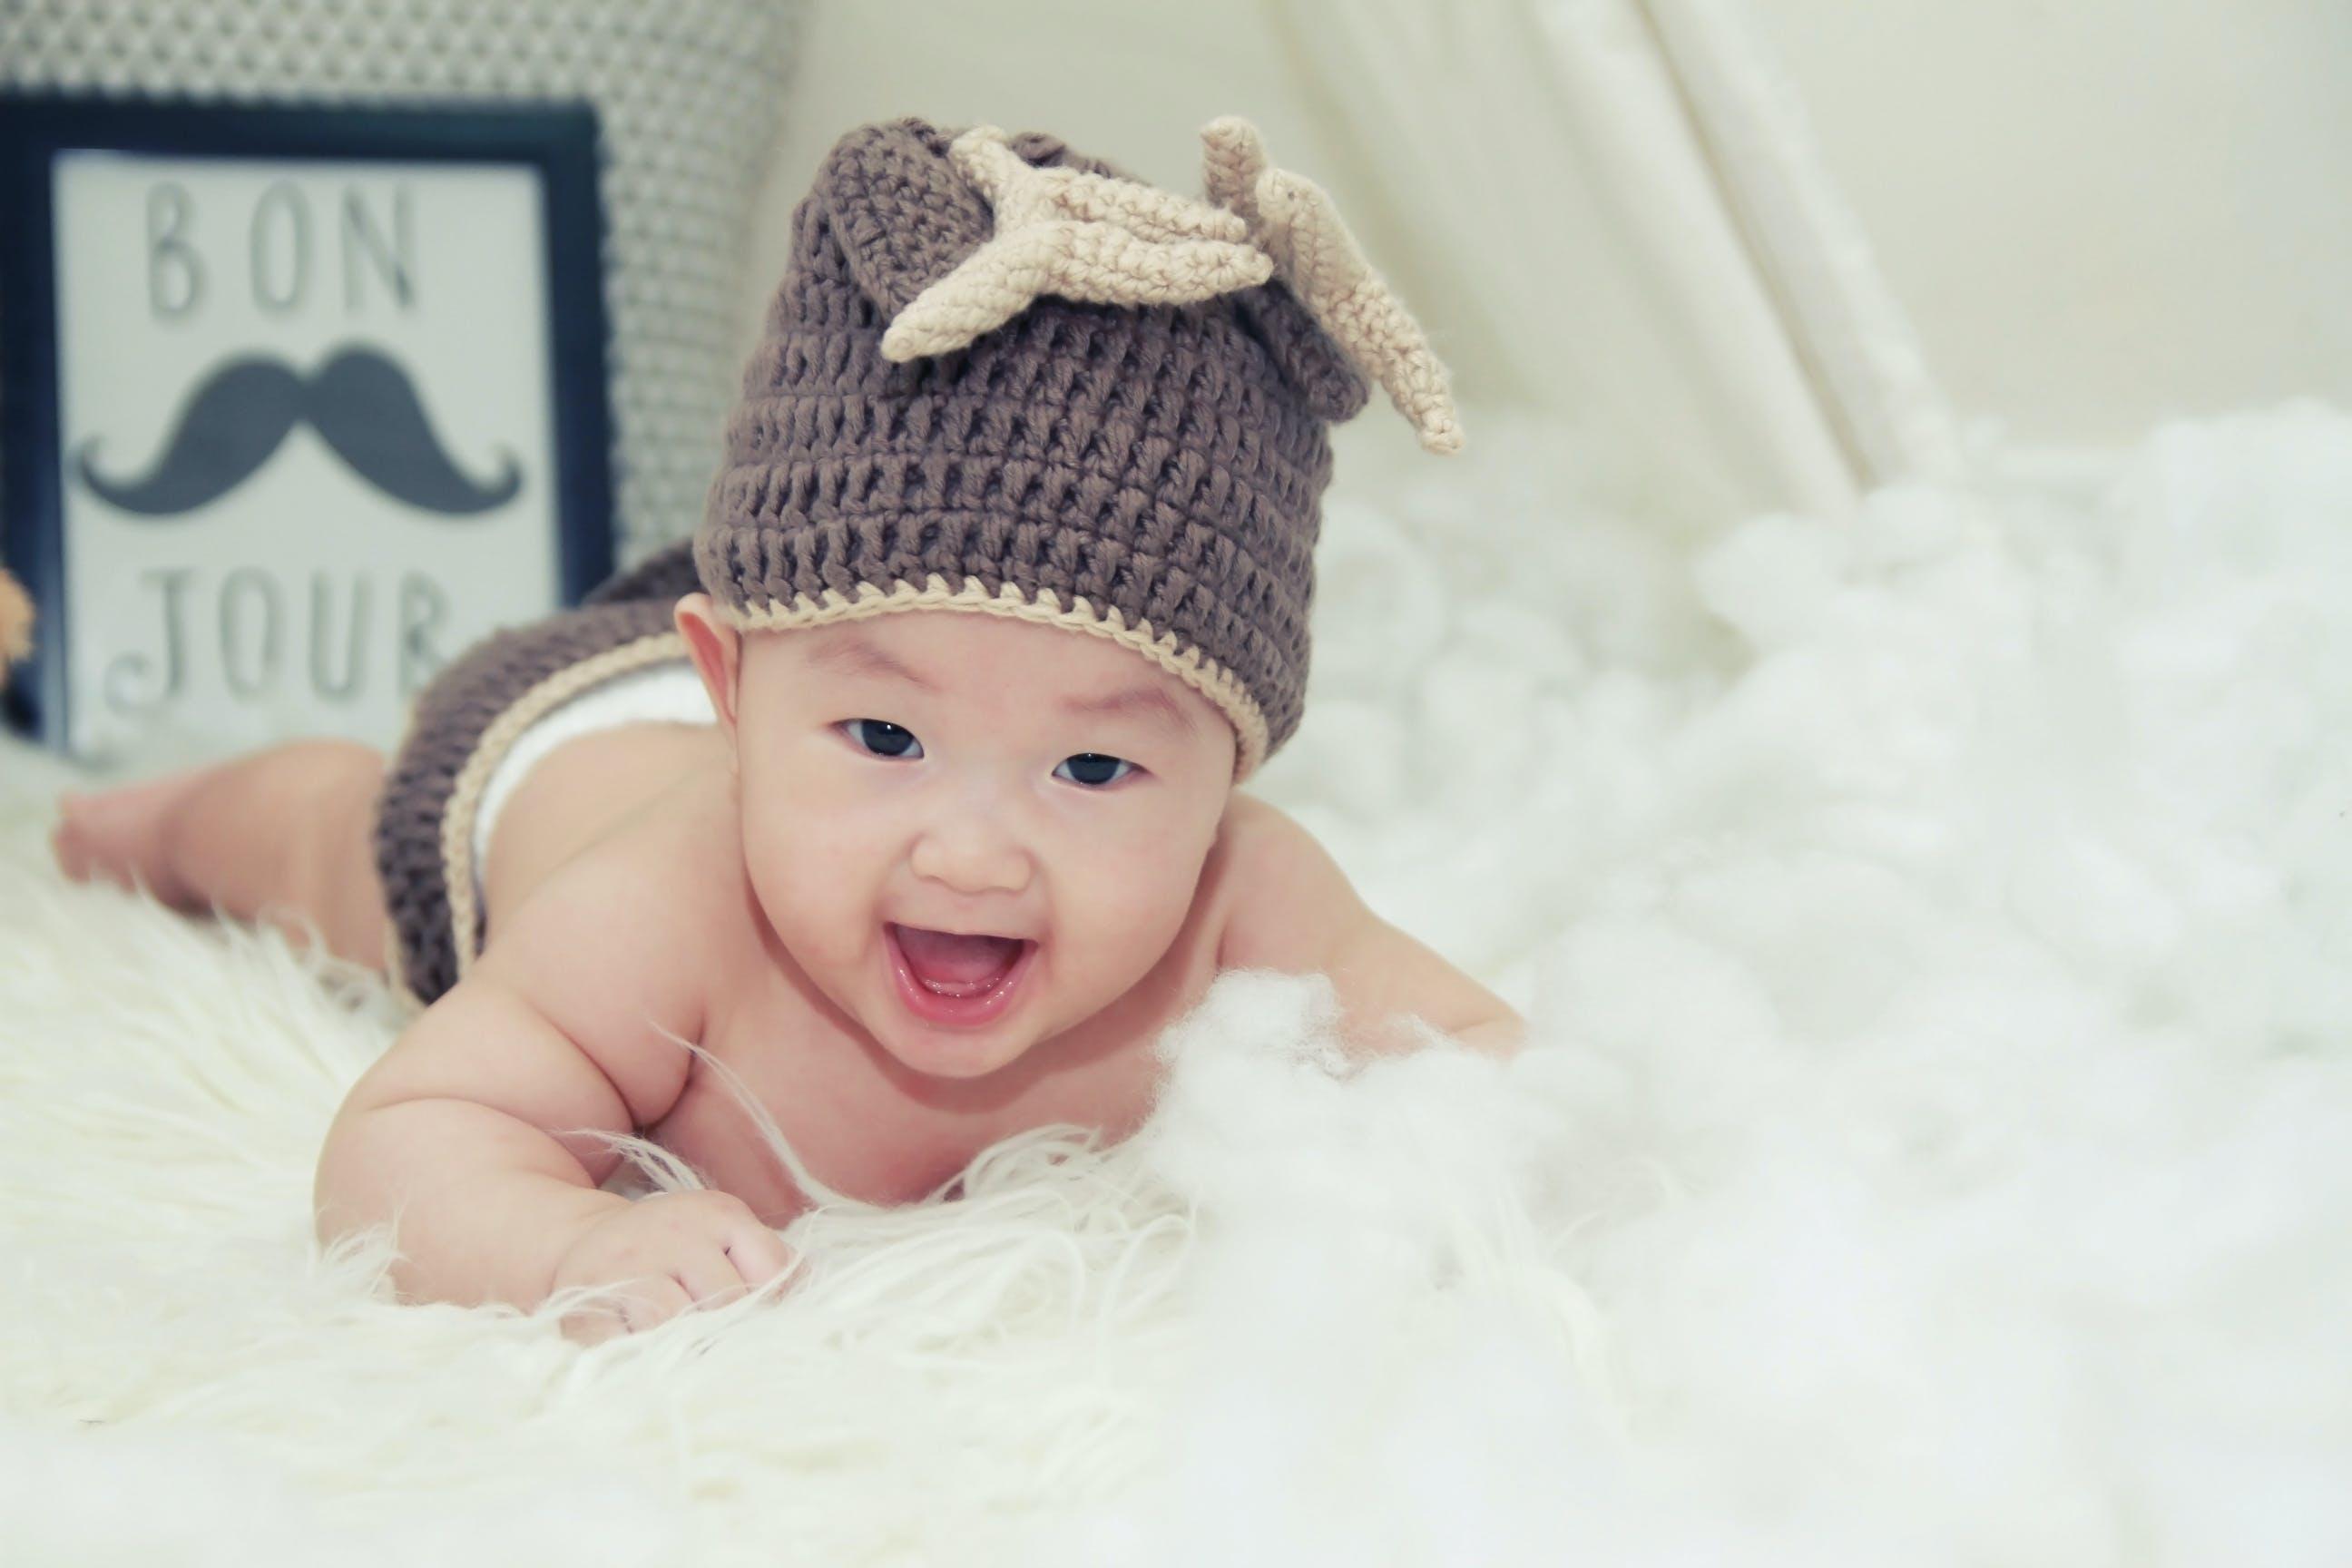 Kostenloses Stock Foto zu baby, bezaubernd, fotoshooting, freude